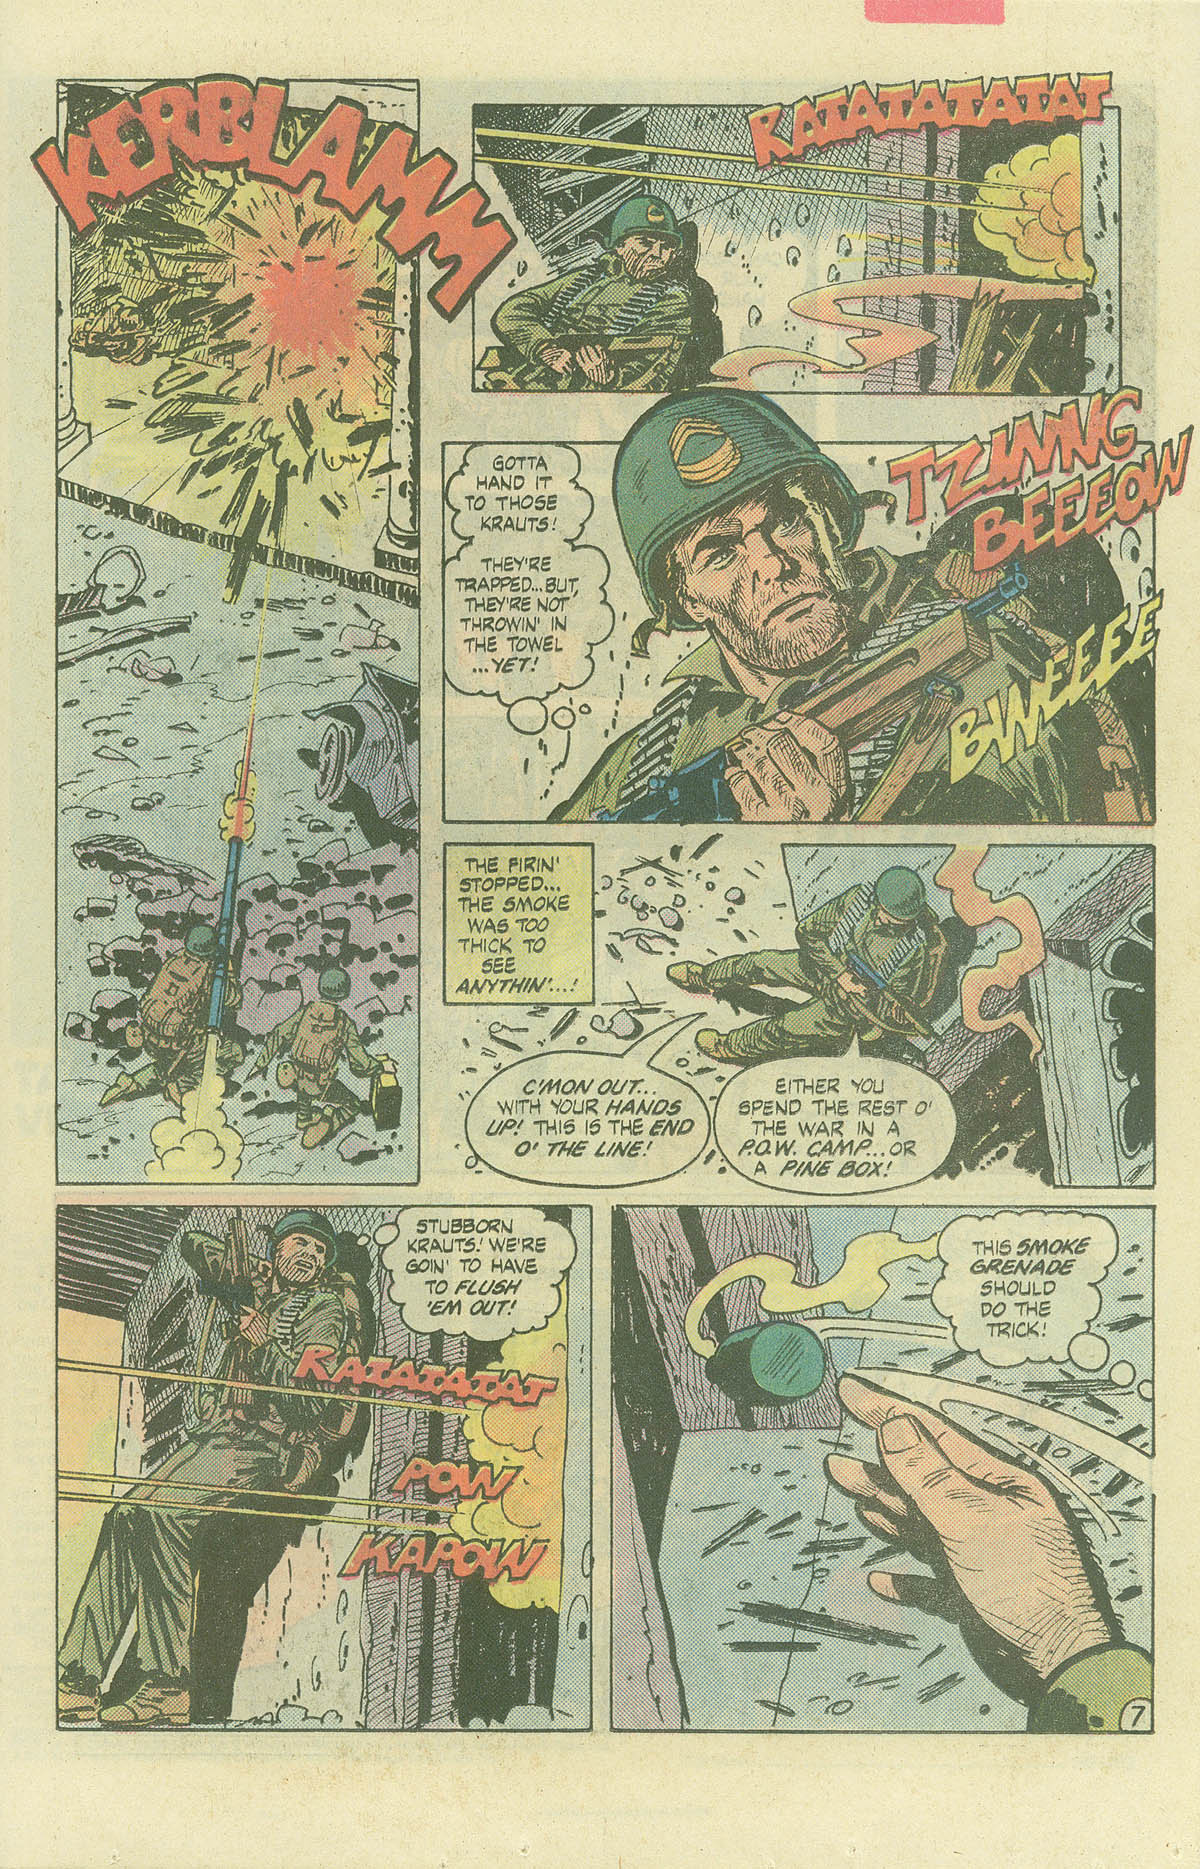 Read online Sgt. Rock comic -  Issue #382 - 10